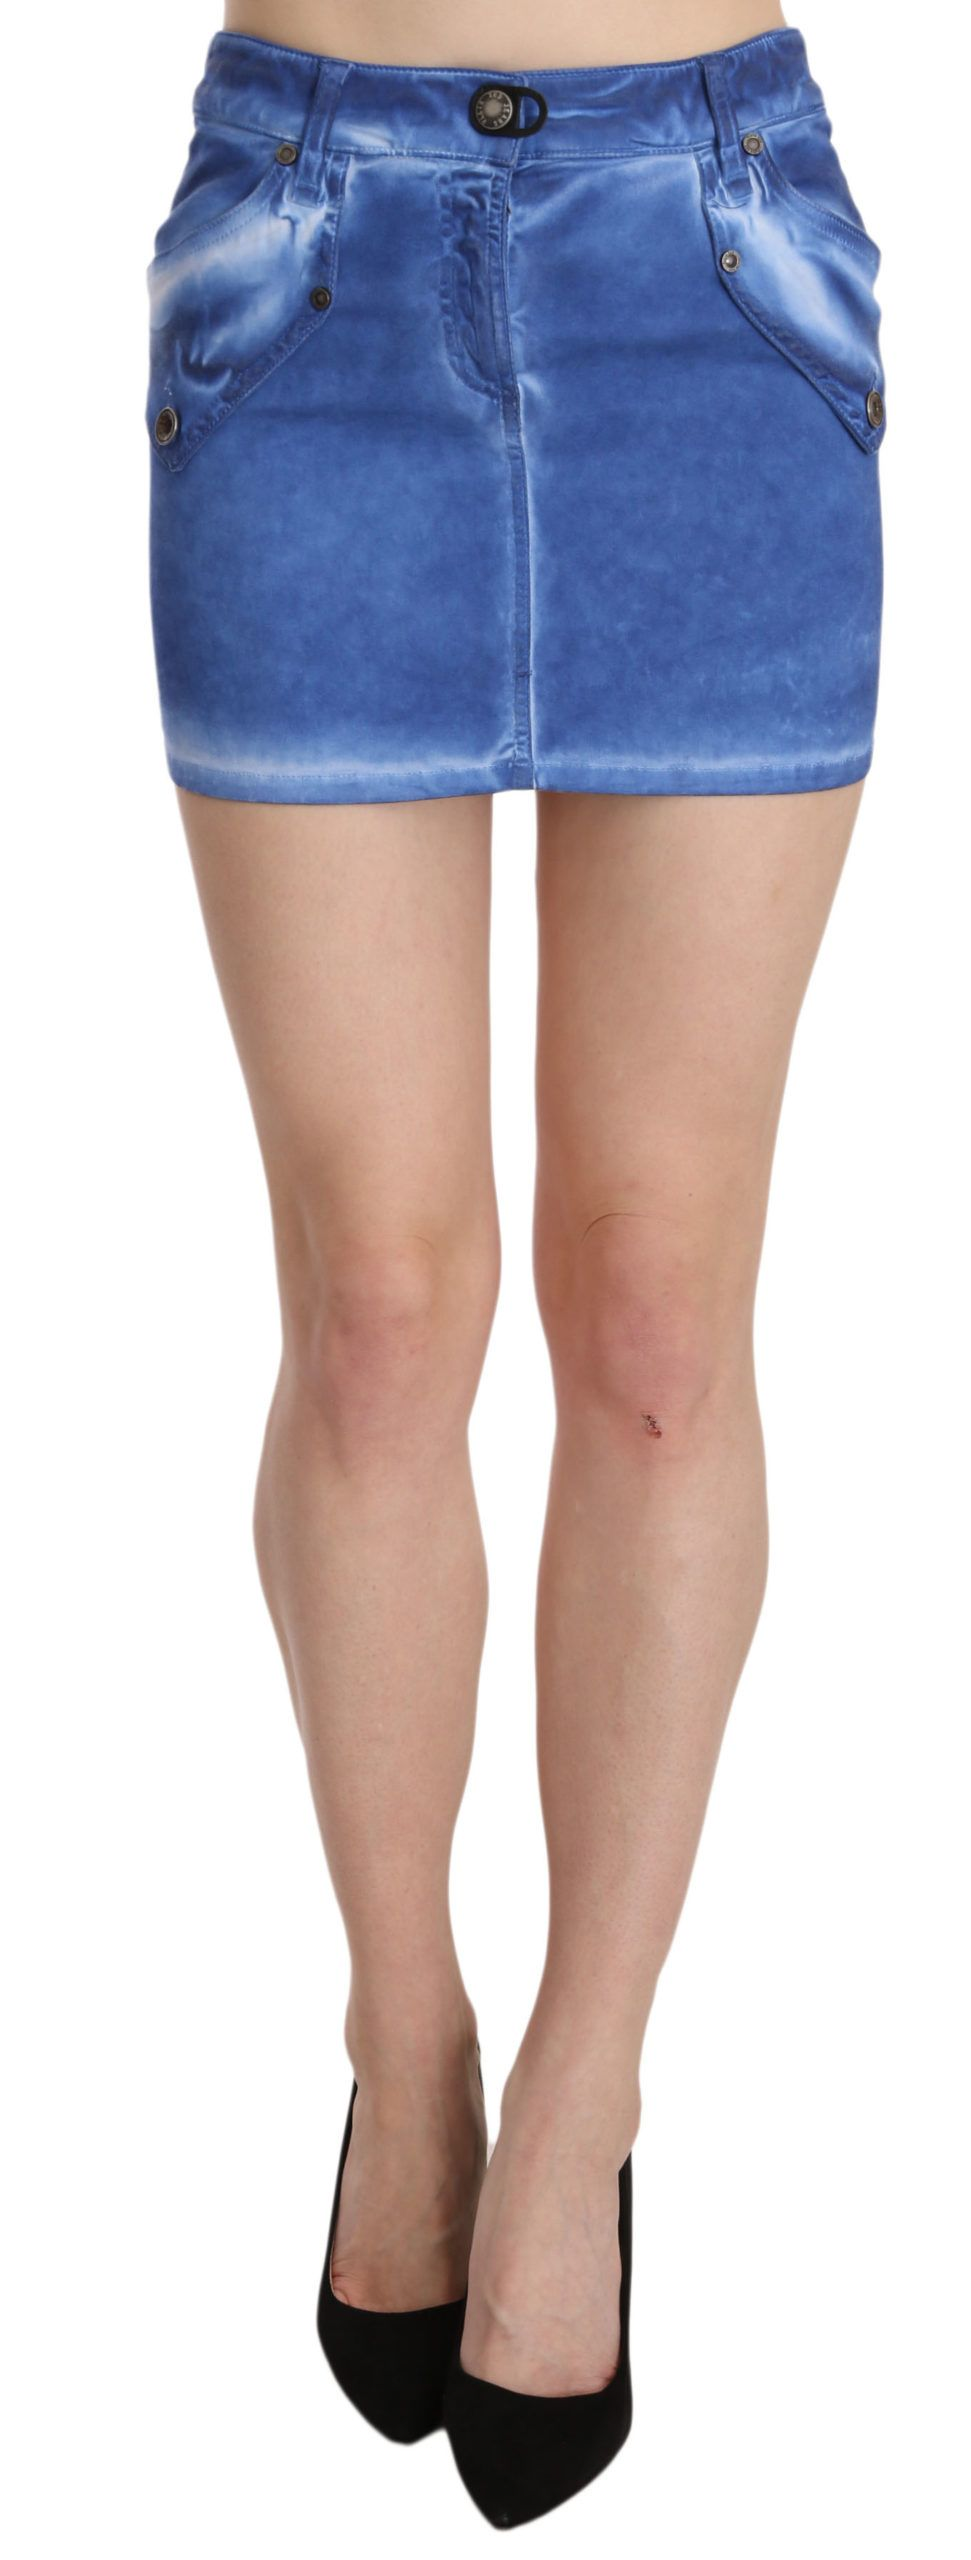 PLEIN SUD Blue Cotton Stretch Casual Mini Skirt